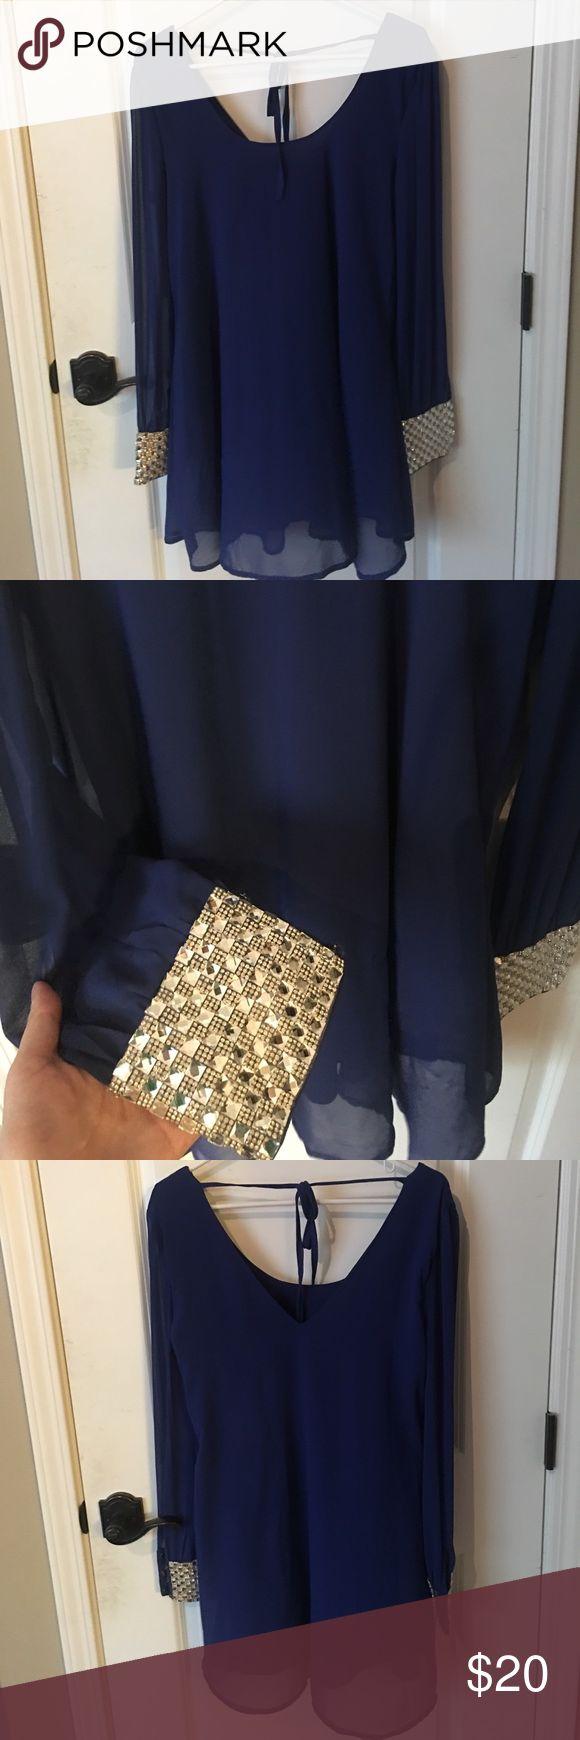 Windsor long sleeve dress Worn once, navy blue long sleeve with rhinestone cuffs, size Medium WINDSOR Dresses Mini